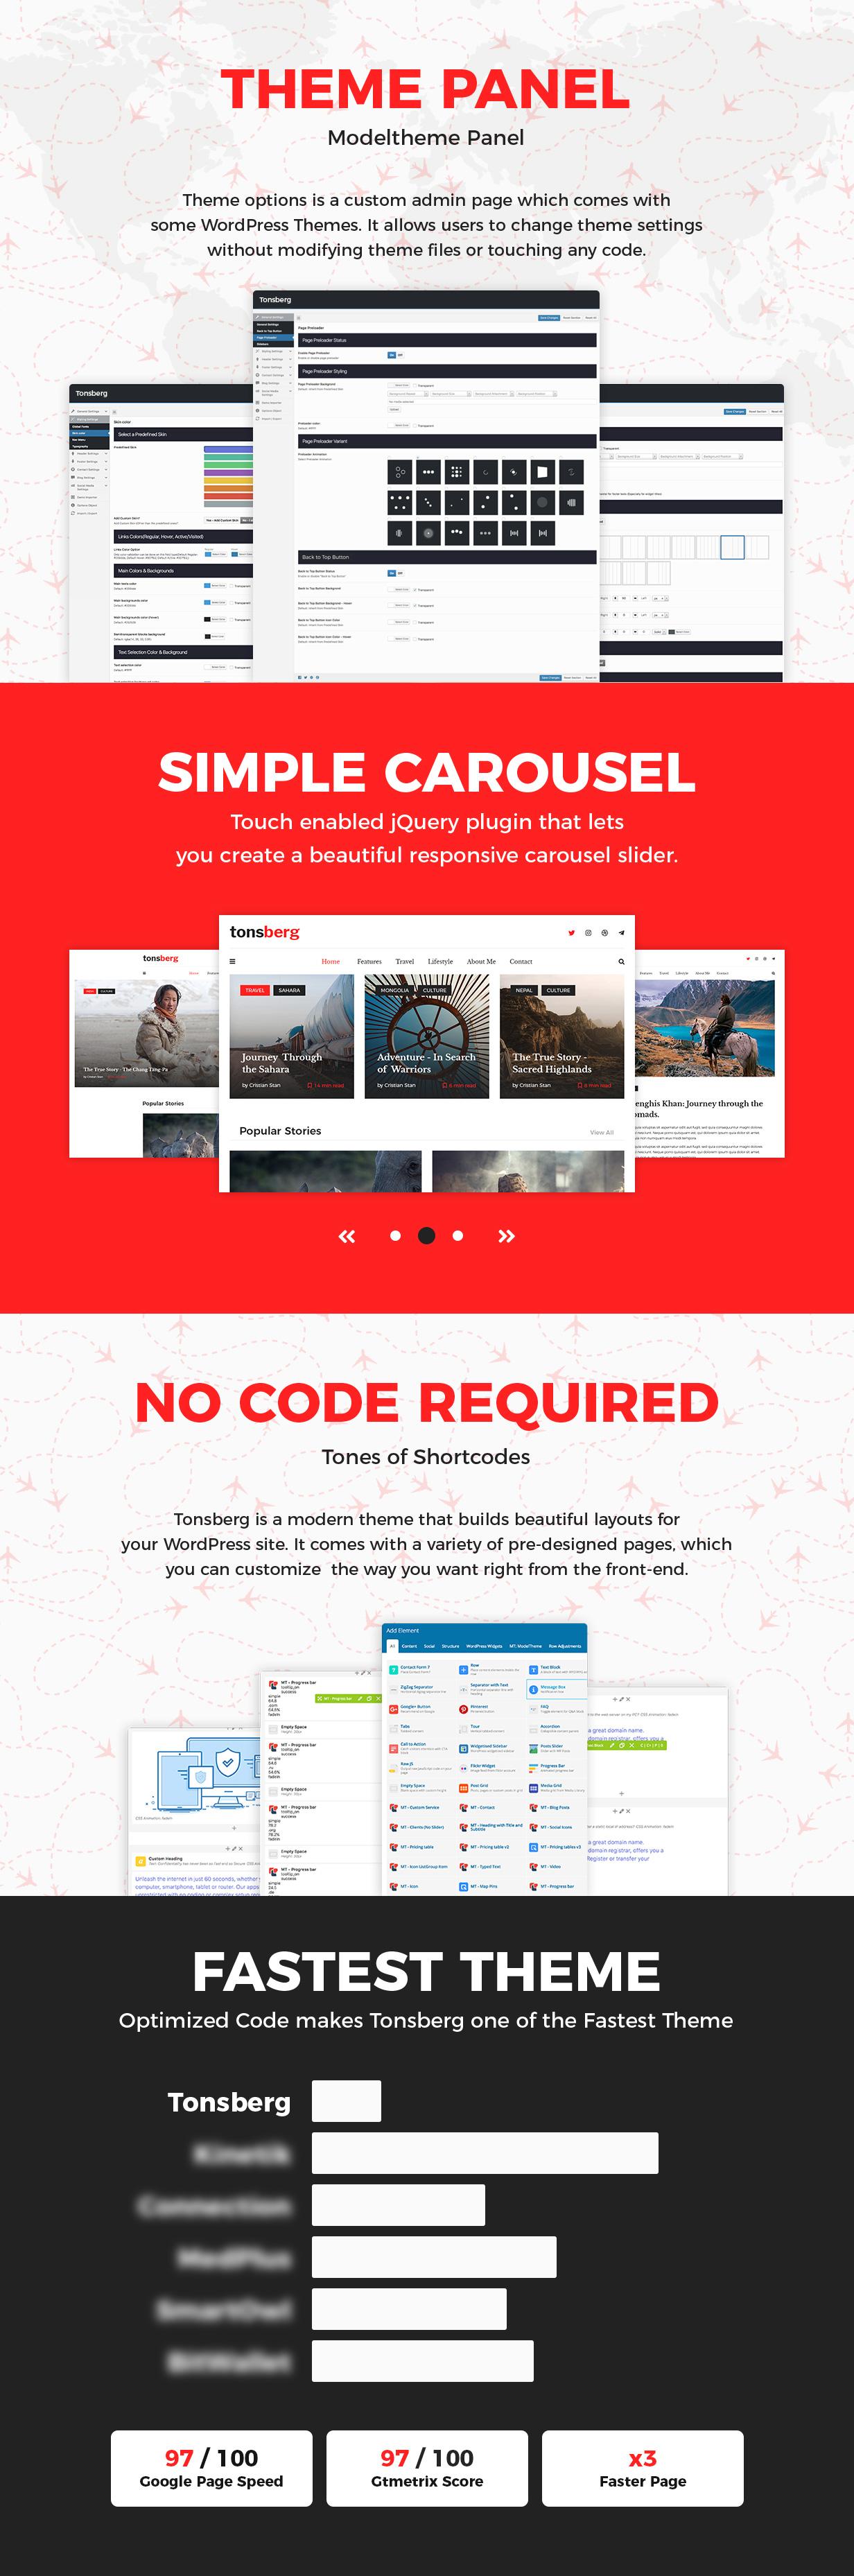 Tonsberg - A Modern WordPress Theme for Travel Bloggers - 5